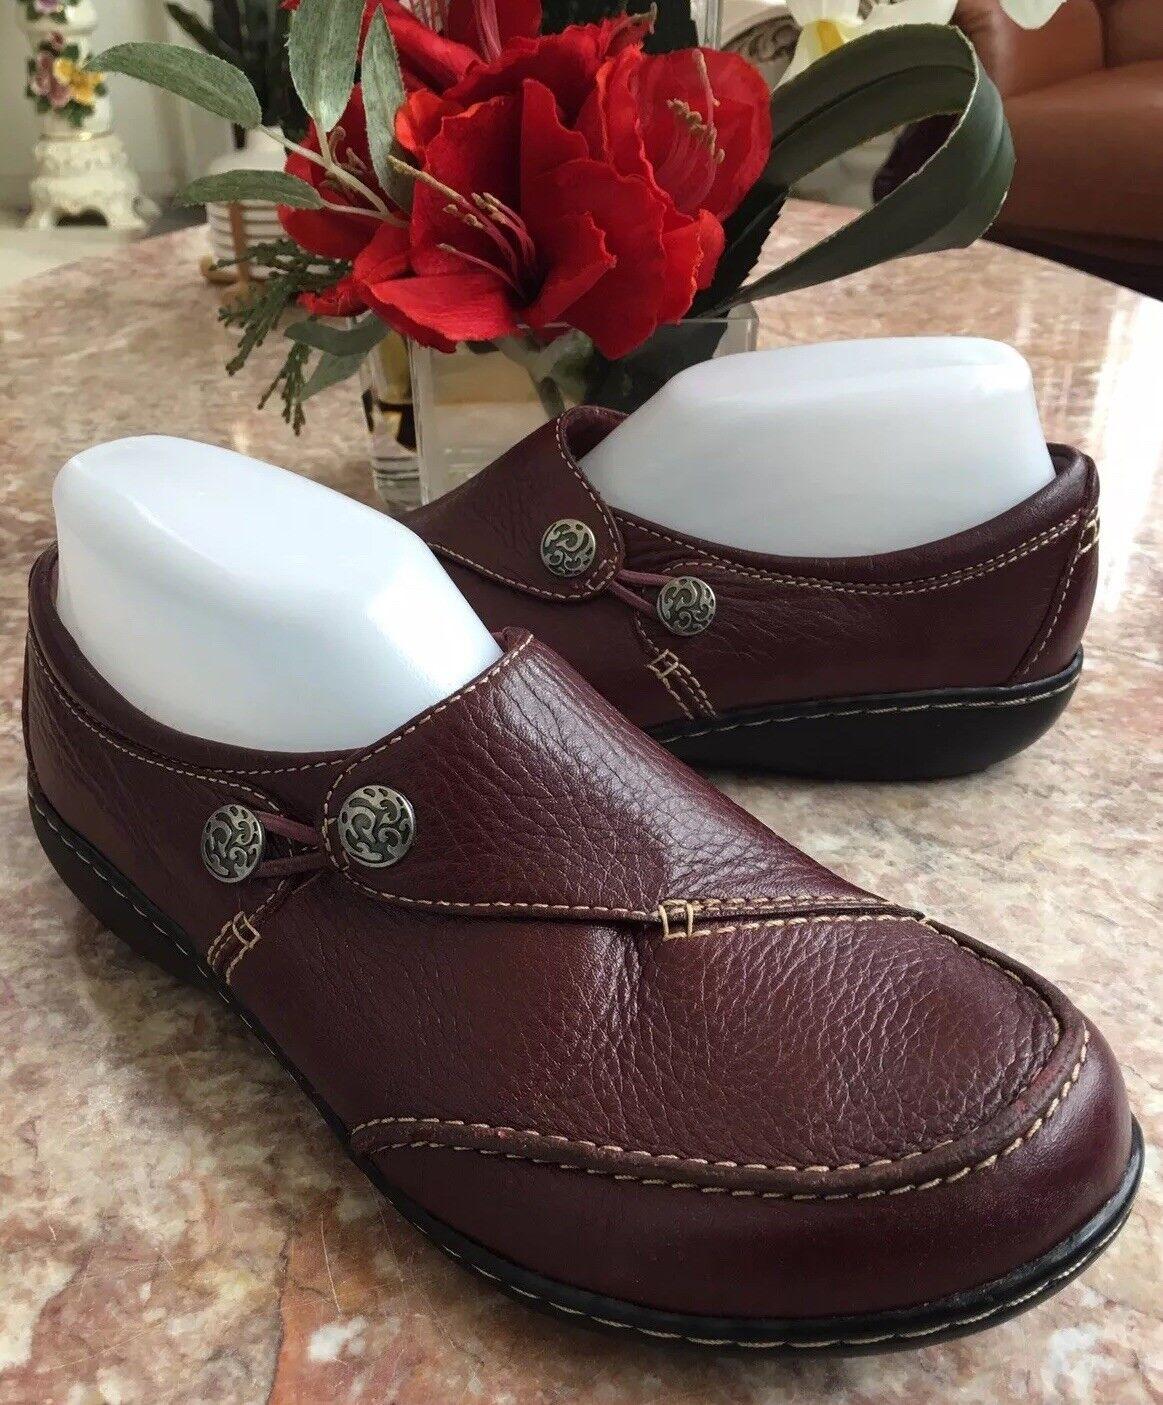 Clarks Bendables Ashland Lane Donna's Burgundy Pelle Loafers Size 8 W MSRP  85